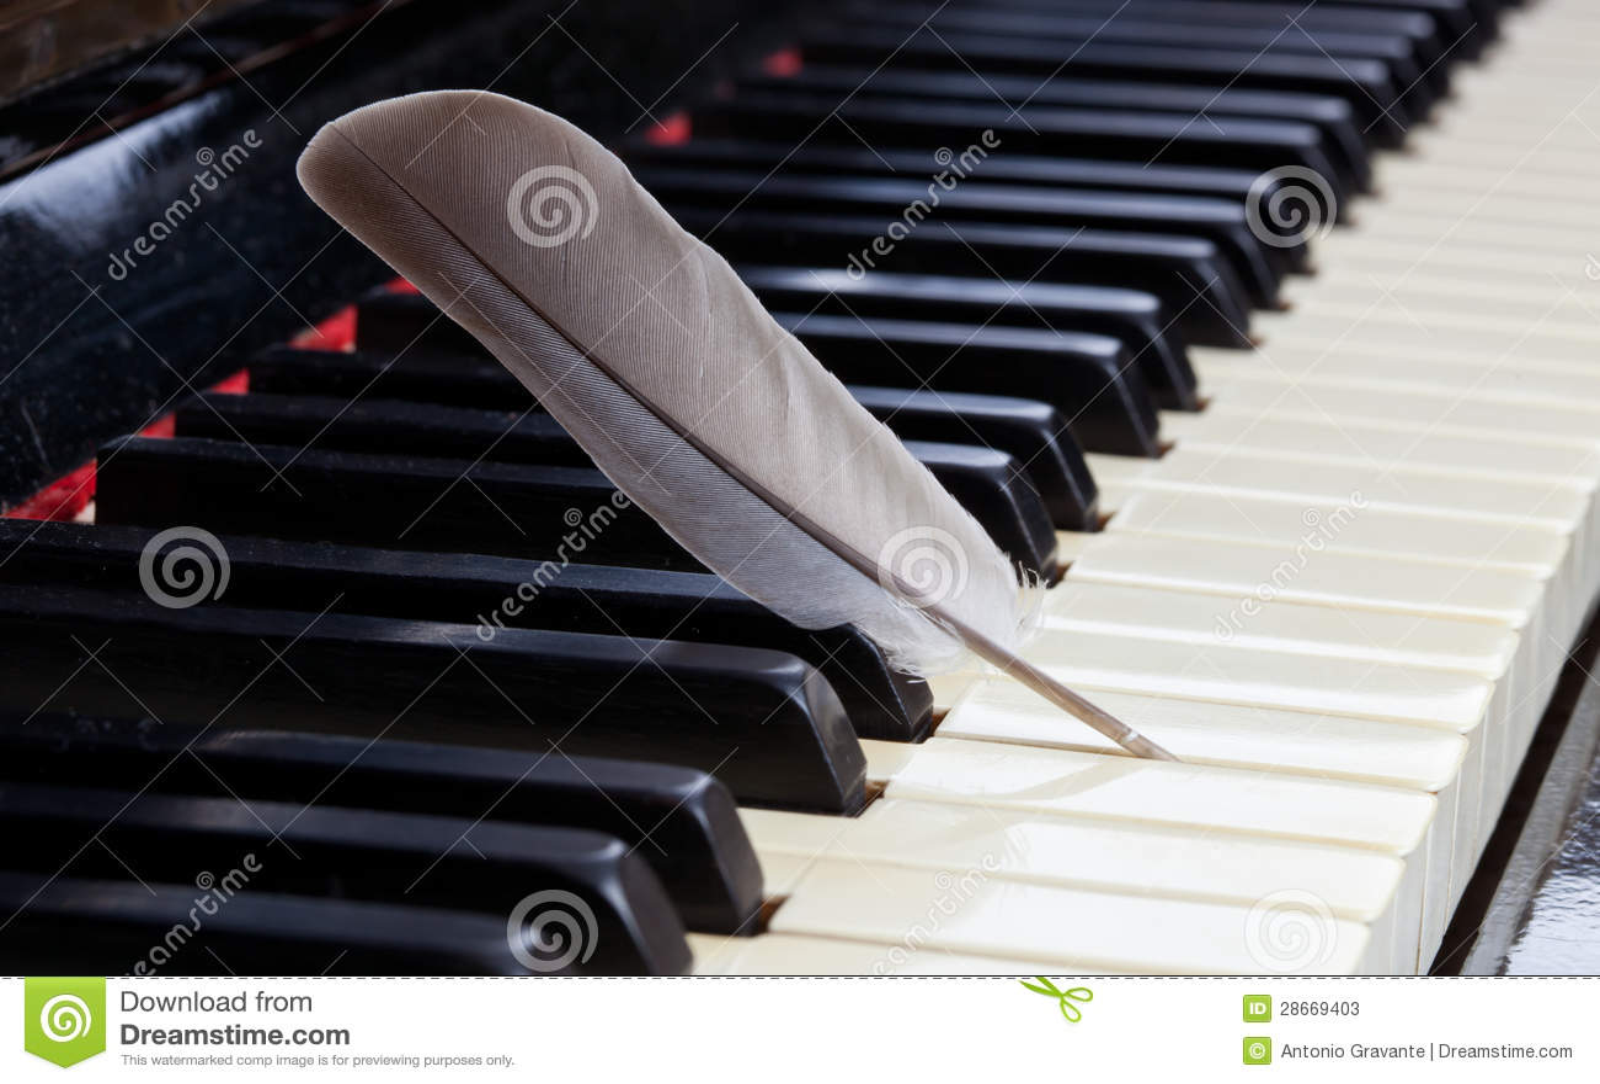 piano musique douce image stock image du objet musical 28669403. Black Bedroom Furniture Sets. Home Design Ideas